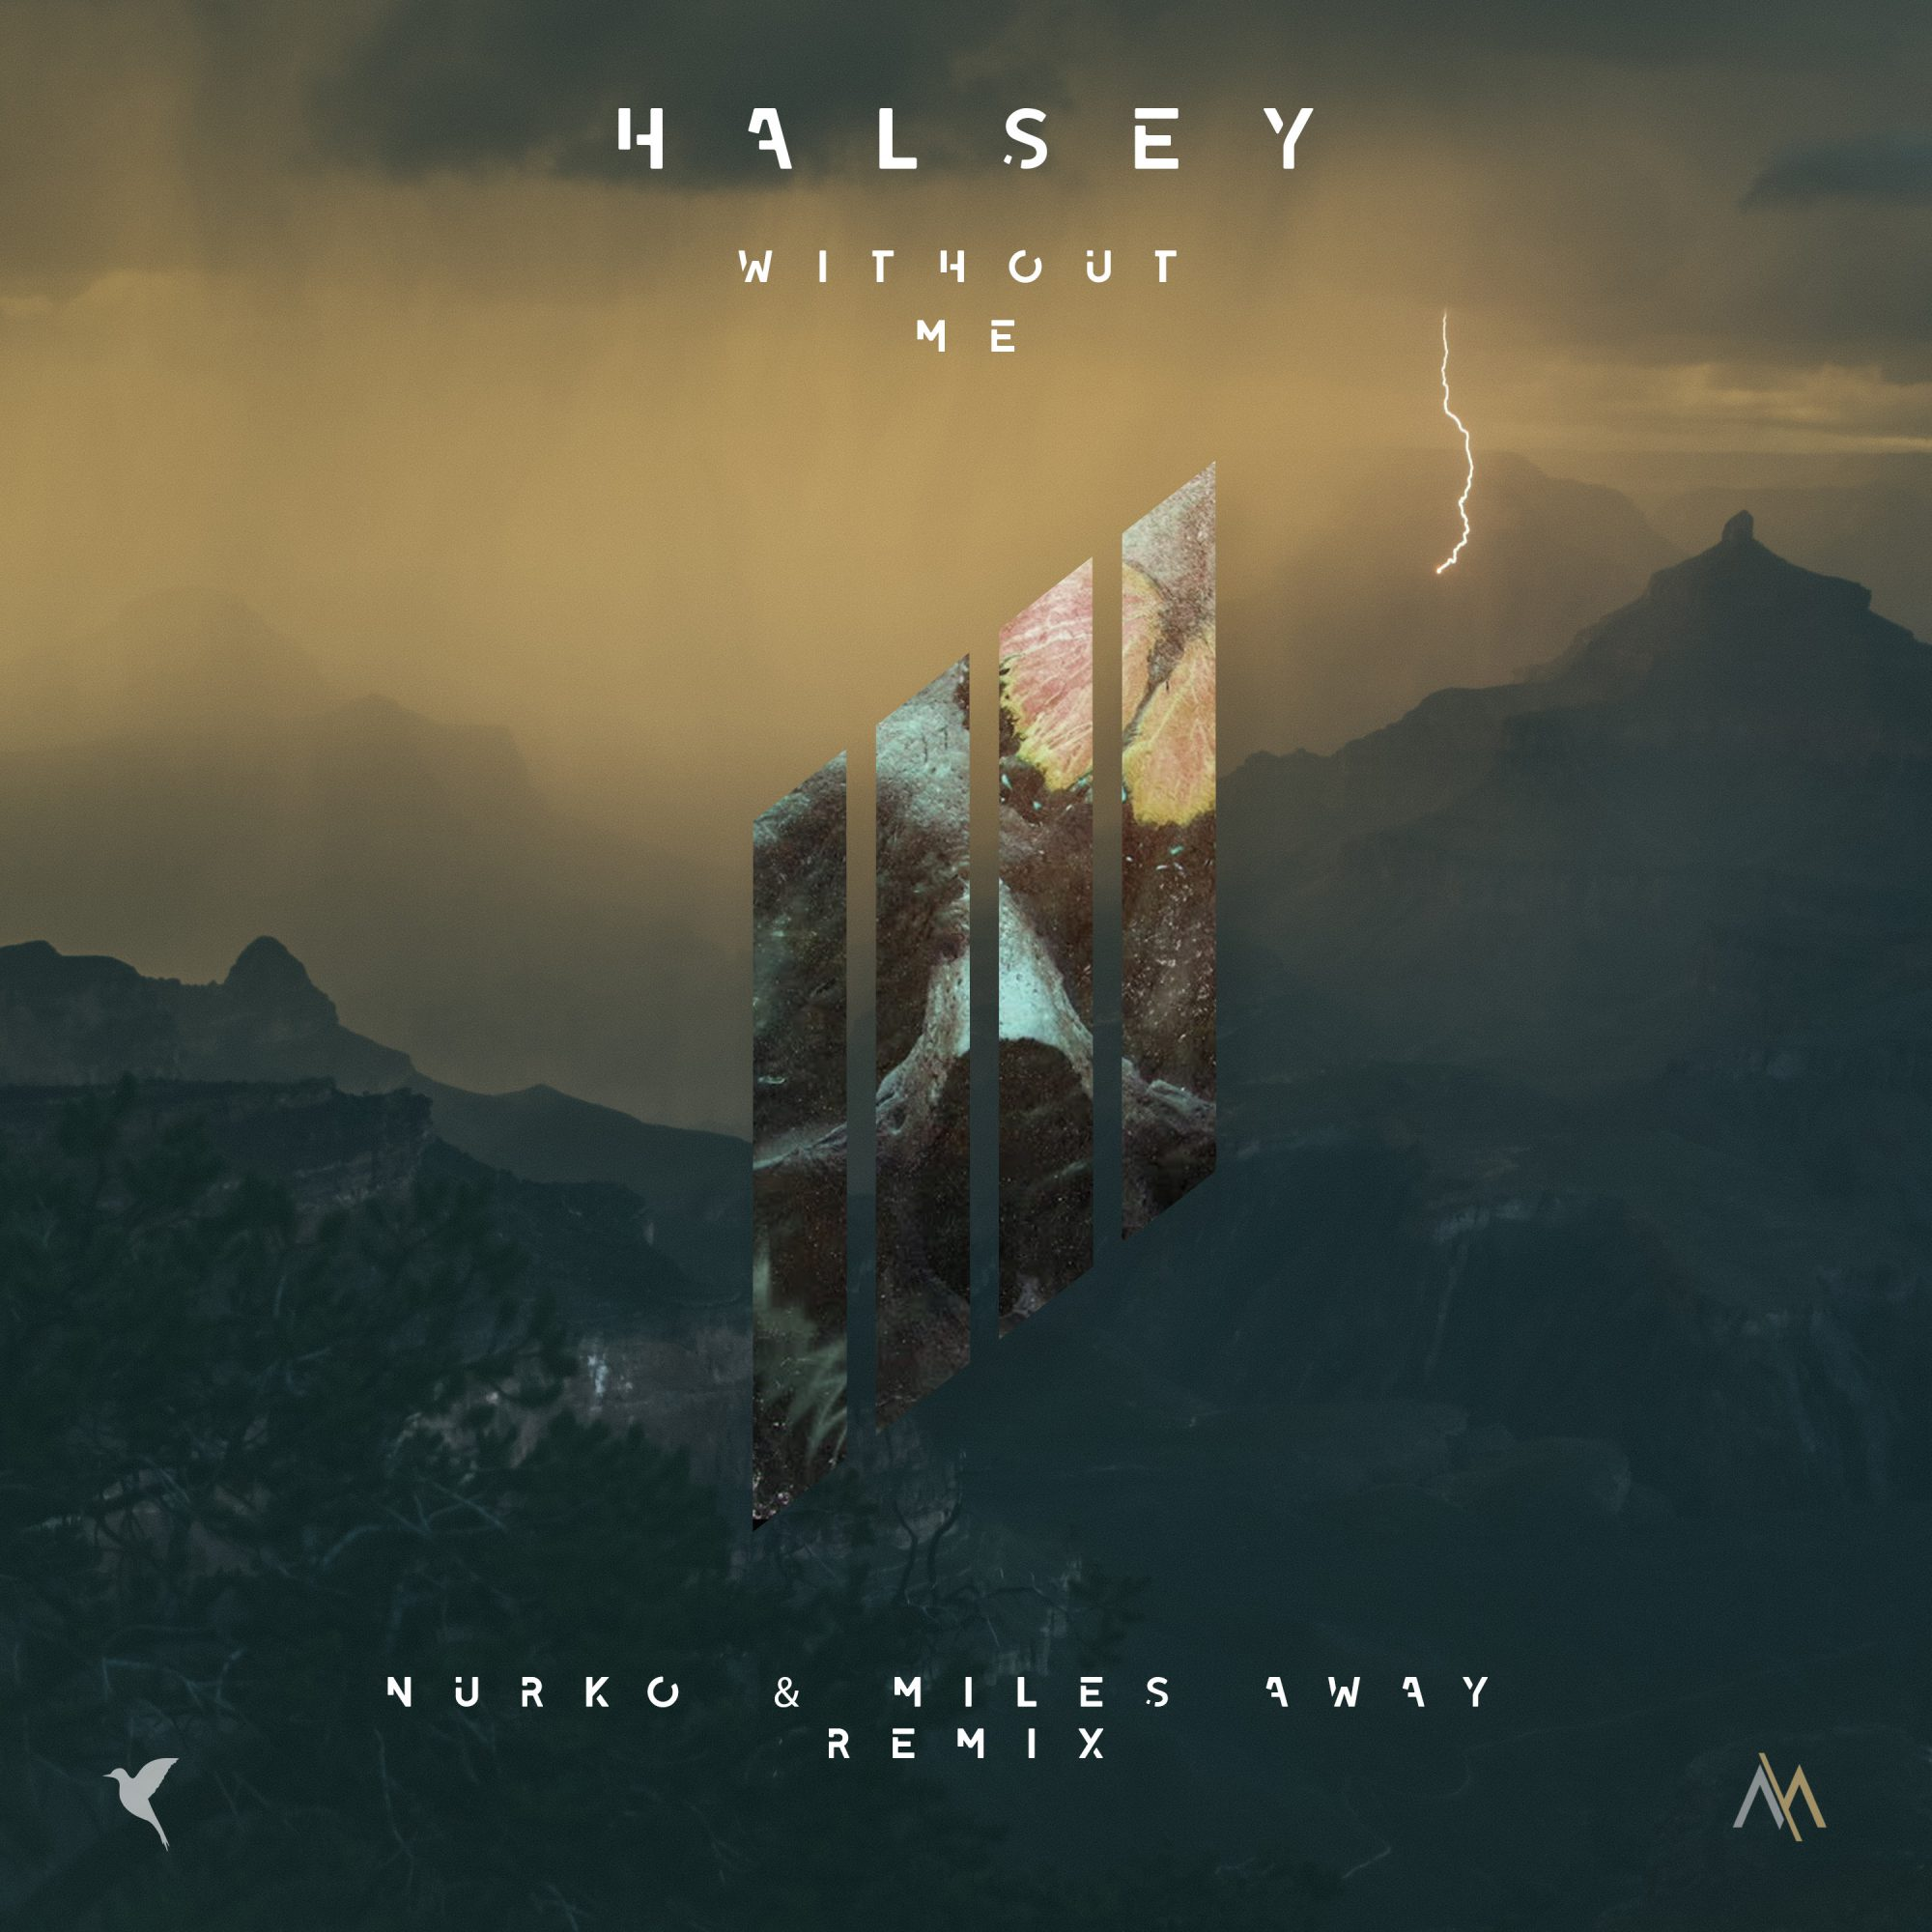 Halsey - Without Me (Nurko & Miles Away Remix) | EDM Identity